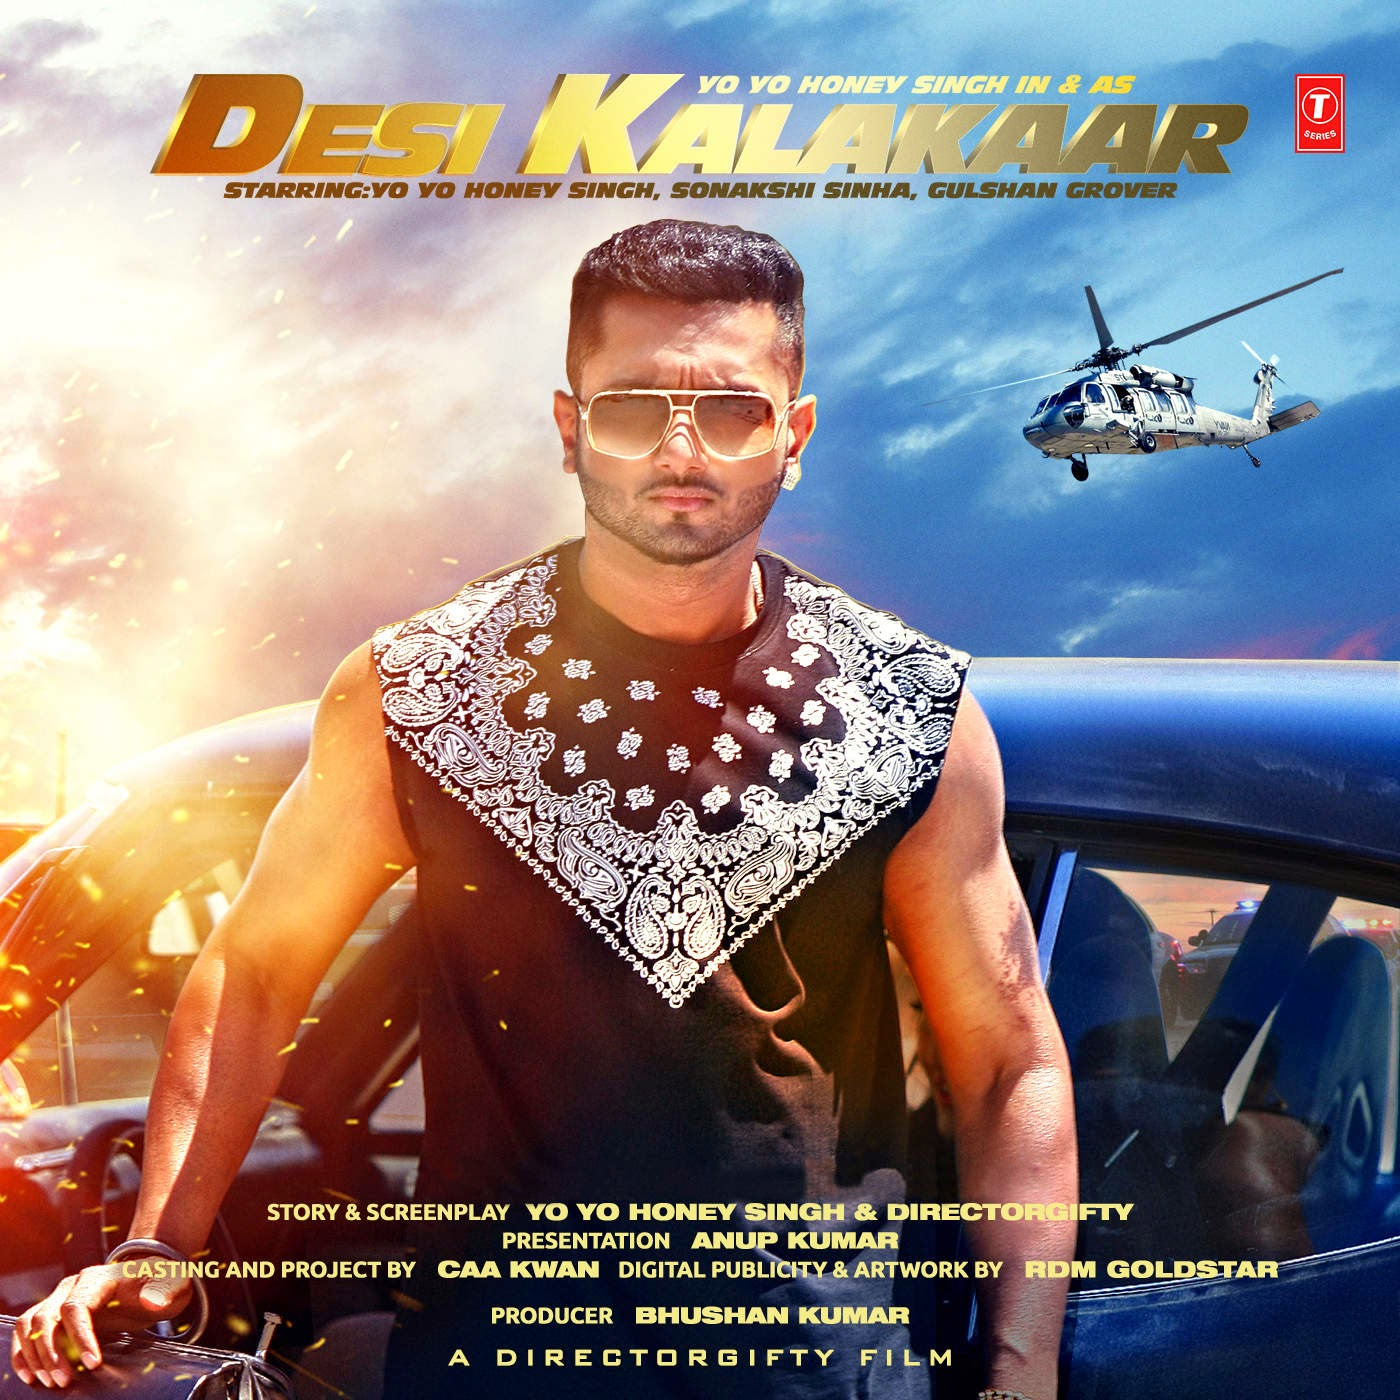 Chahunga Main Tujhe Hardam Albums Name: Yaar Mera Desi Kalakaar Lyrics